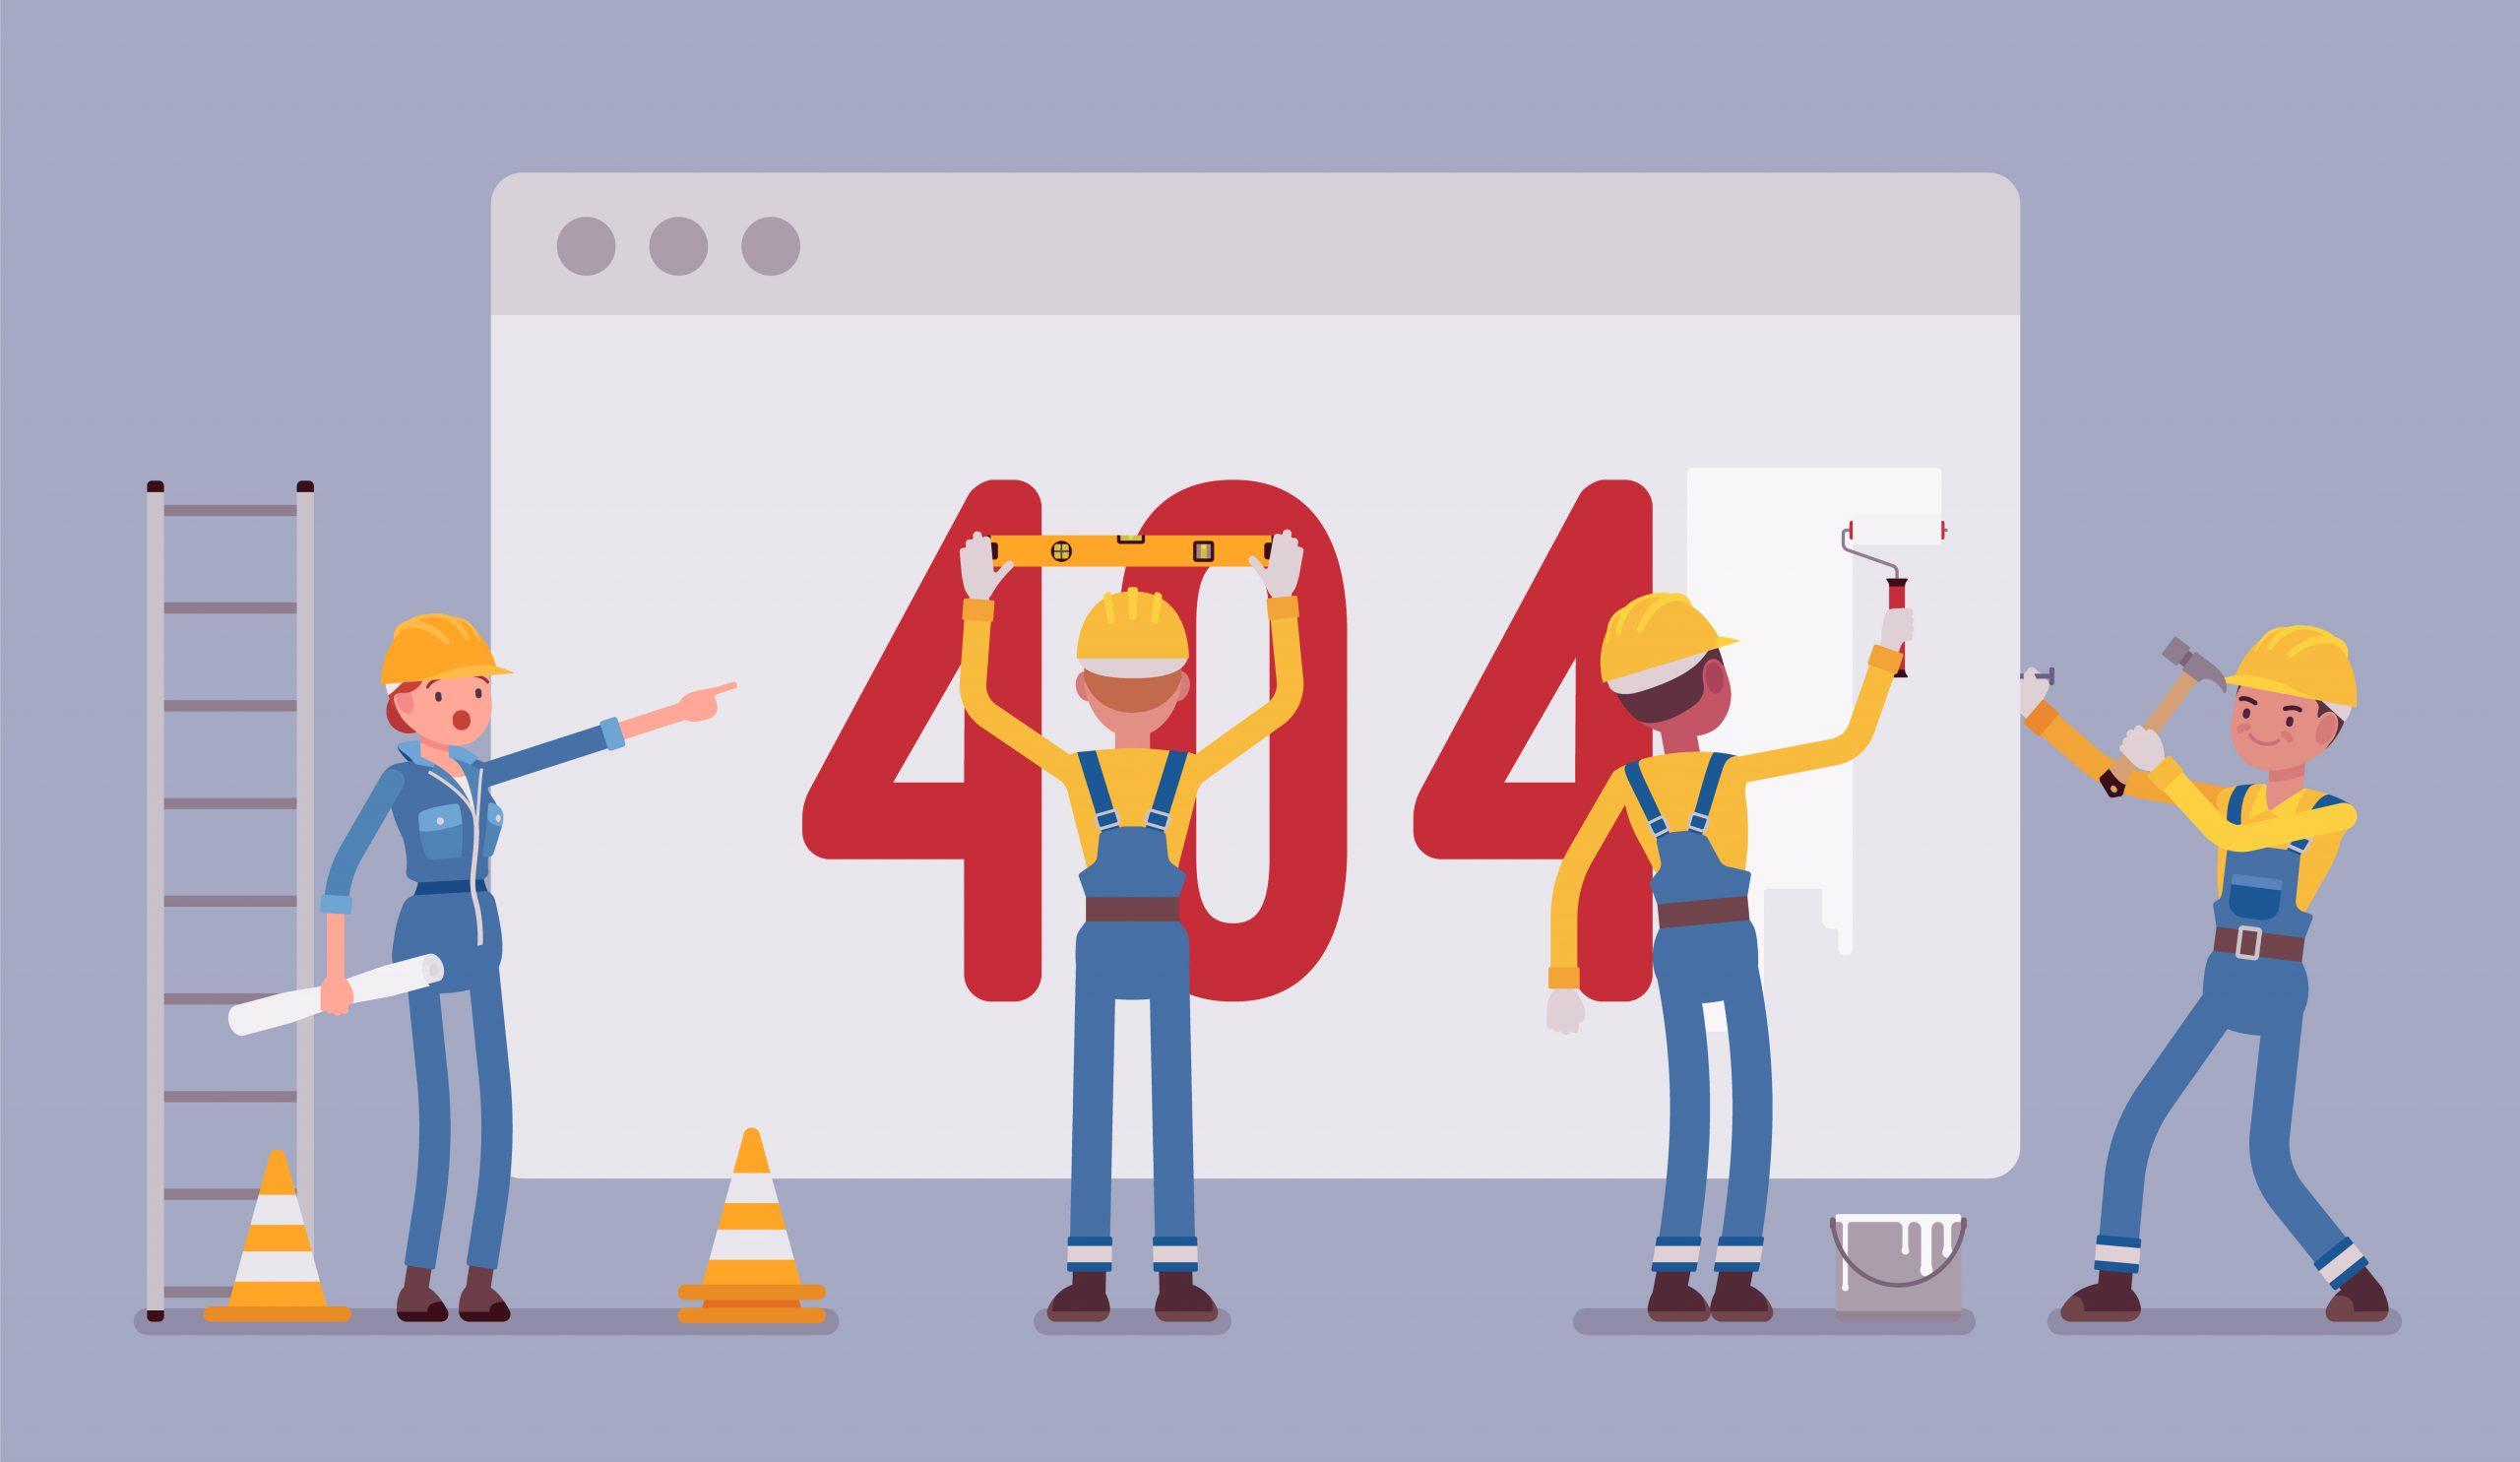 Cartoon characters trying to fix an SEO 404 error